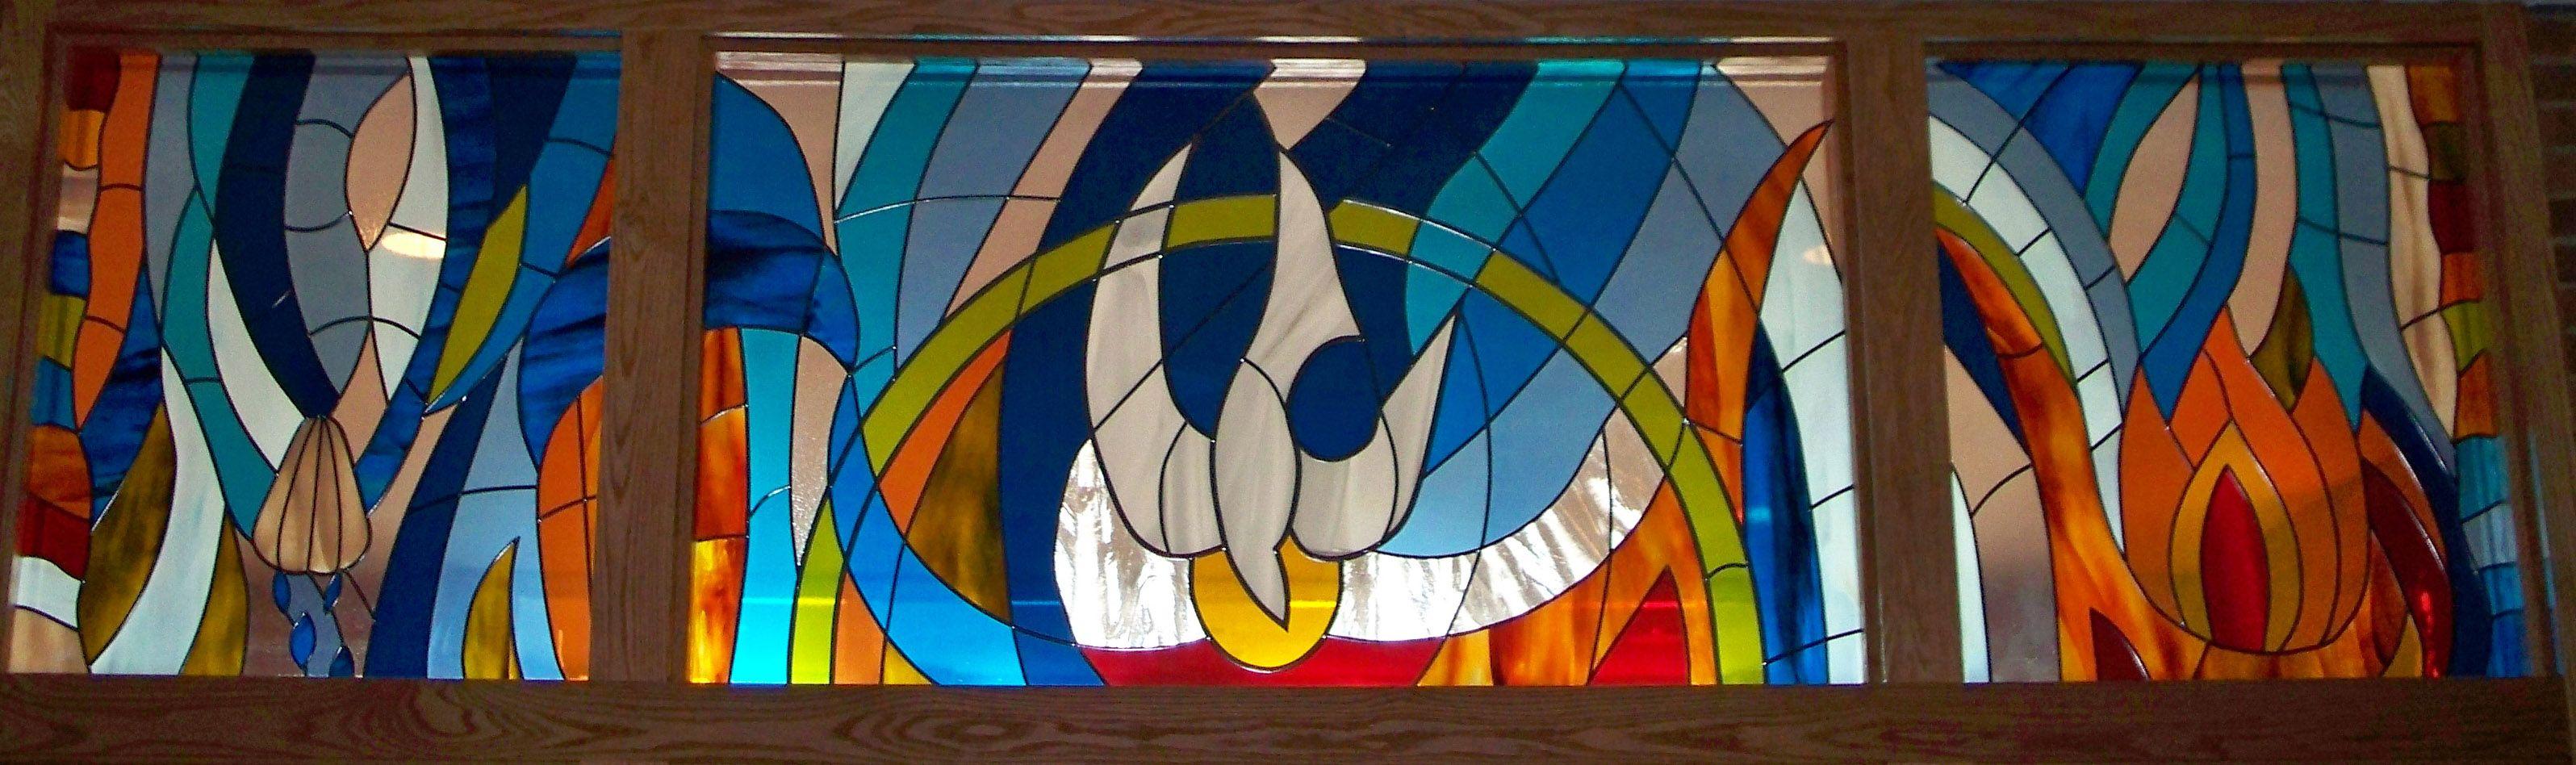 Custom Glass, Stained Glass, Glass Art, Cut Glass, Glass Inserts